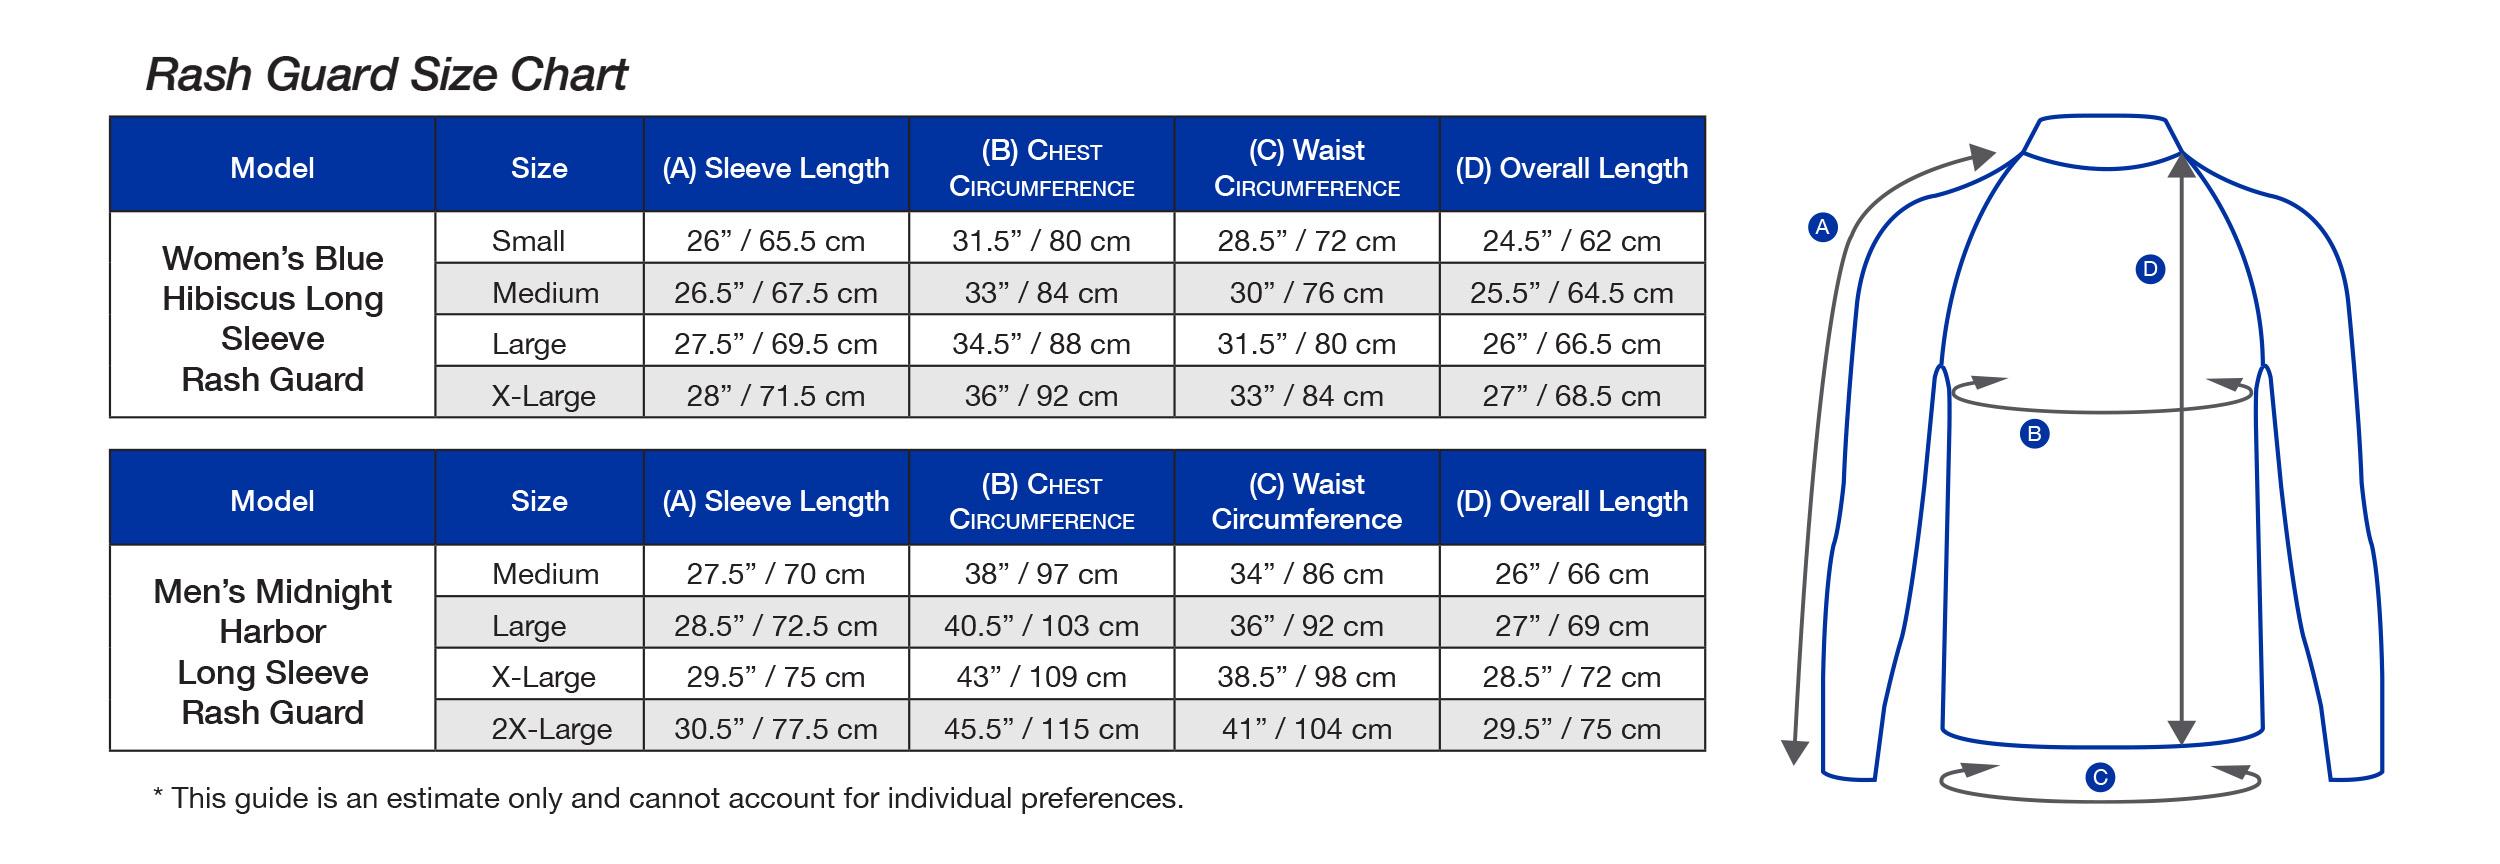 Rash-Guard-Size-Chart.jpg